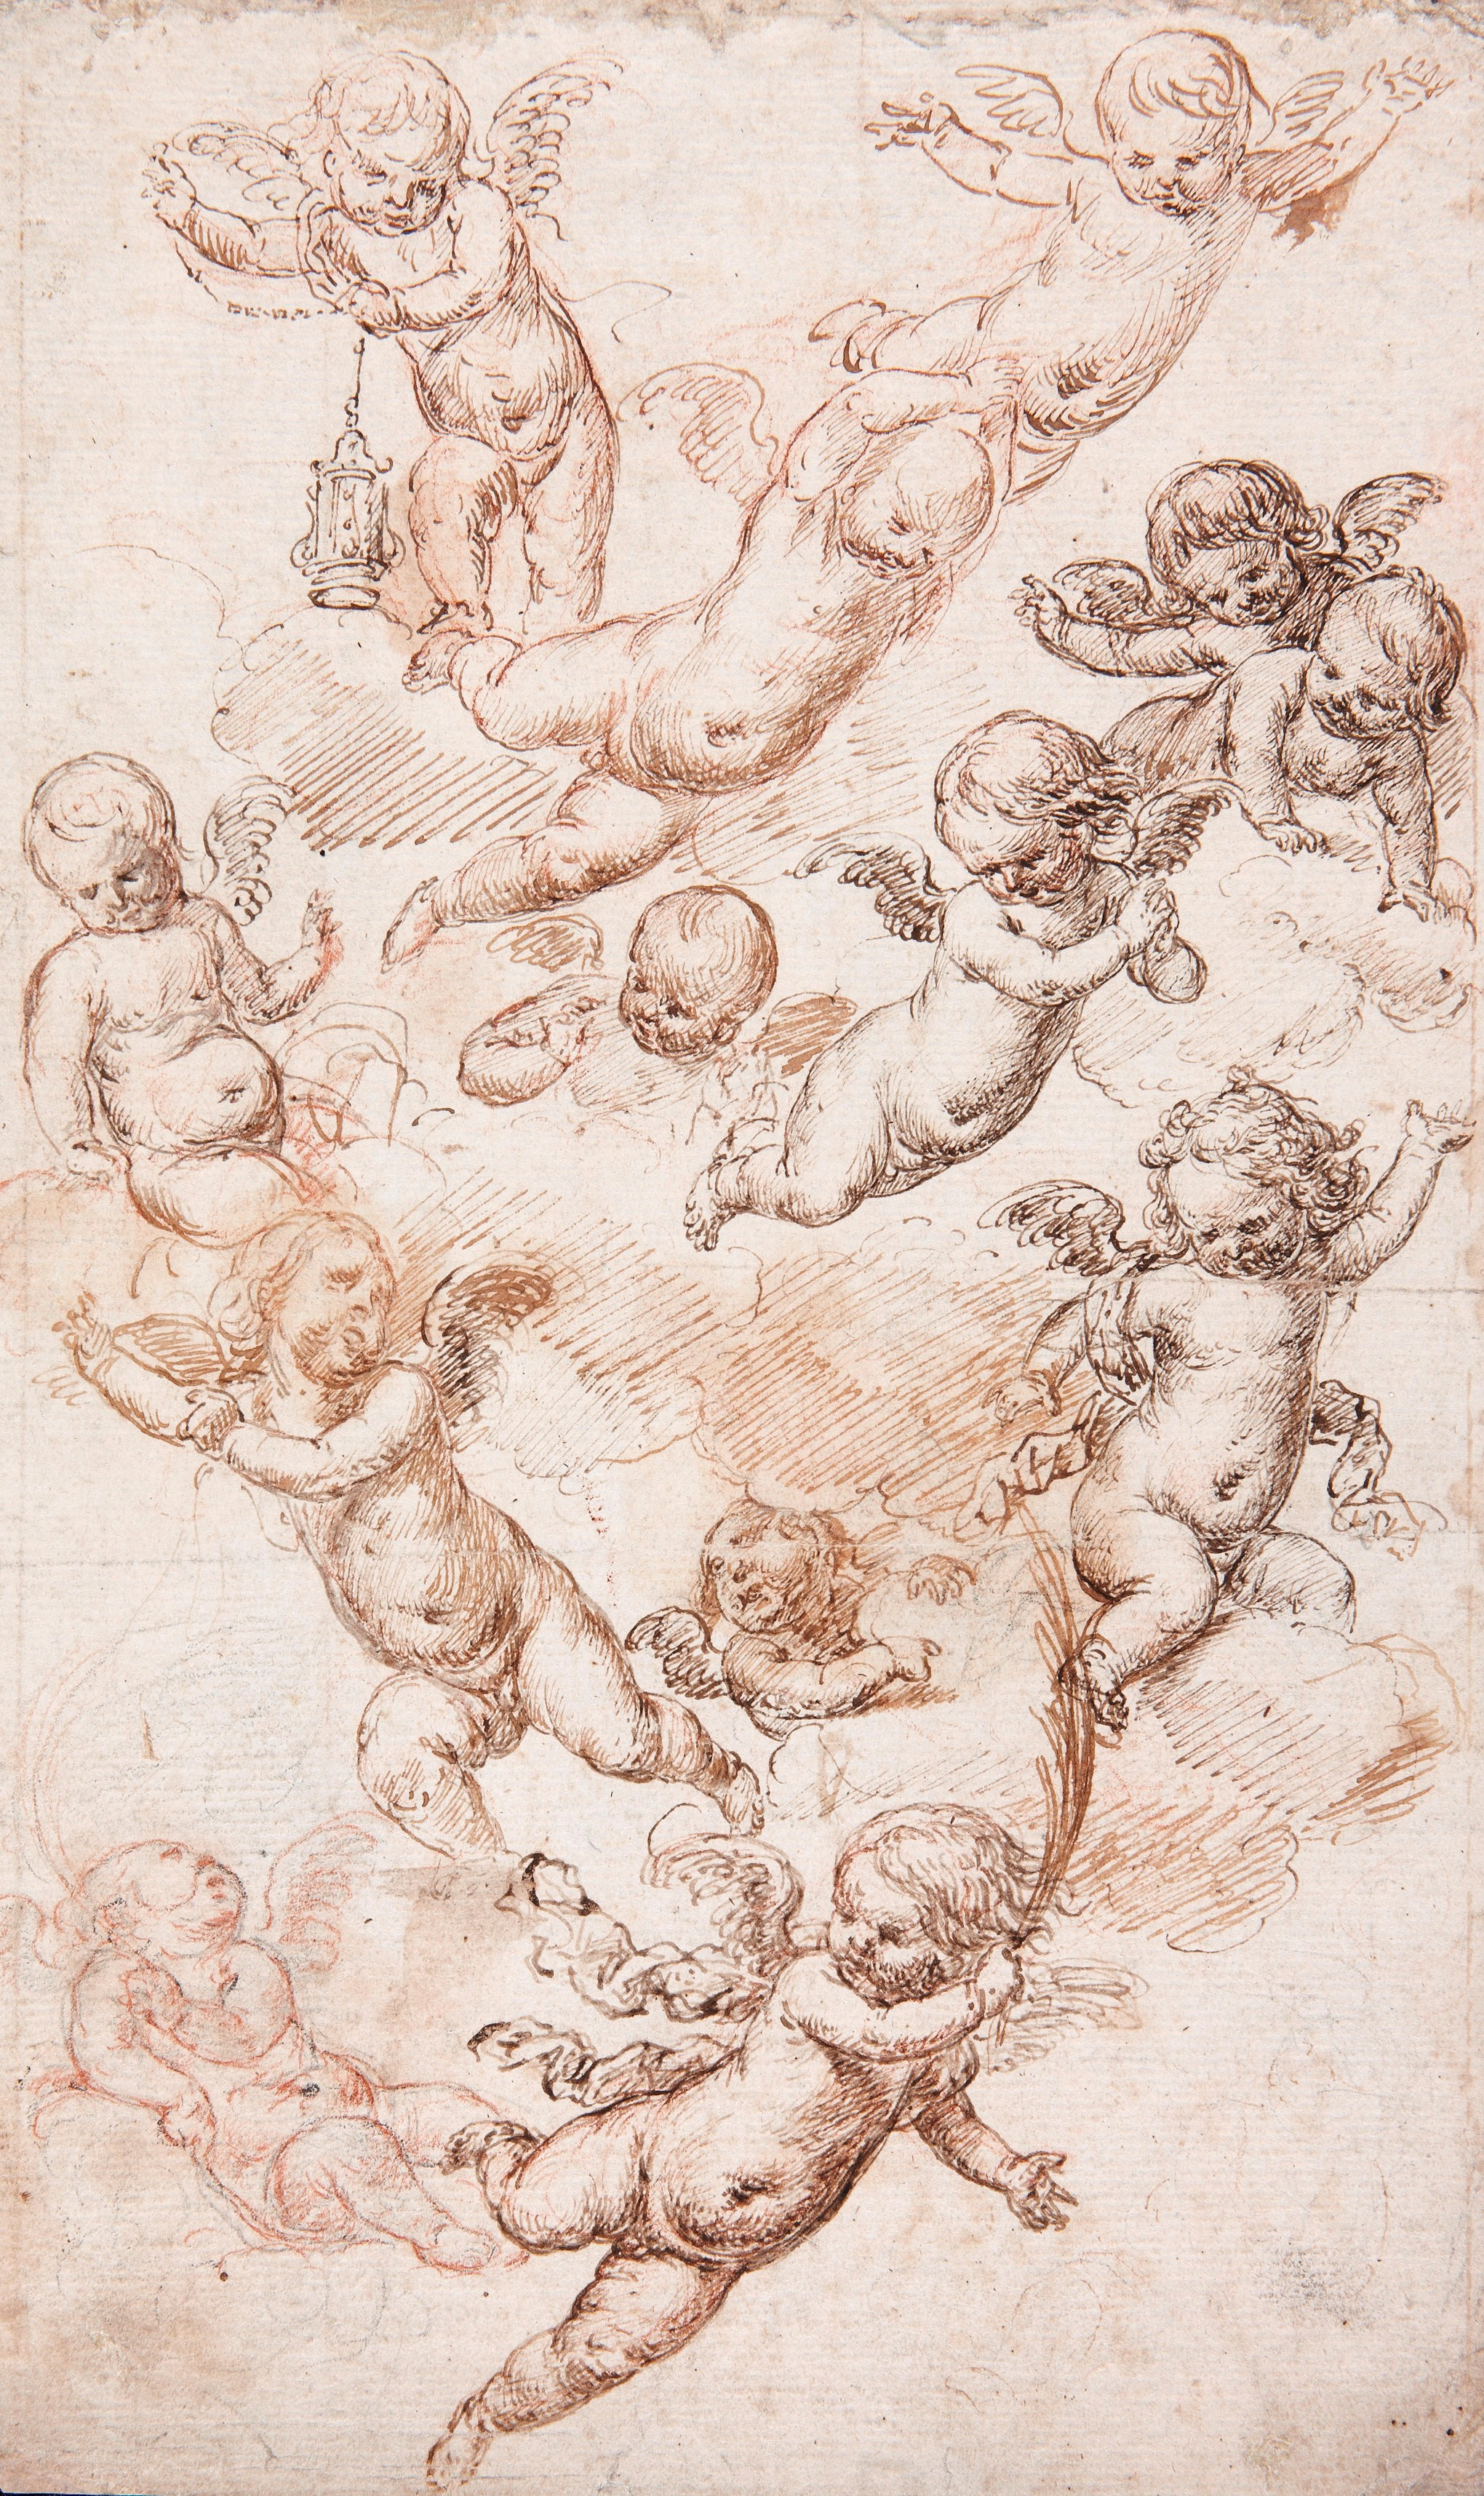 Child Angels in Flight - Antonio de Pereda